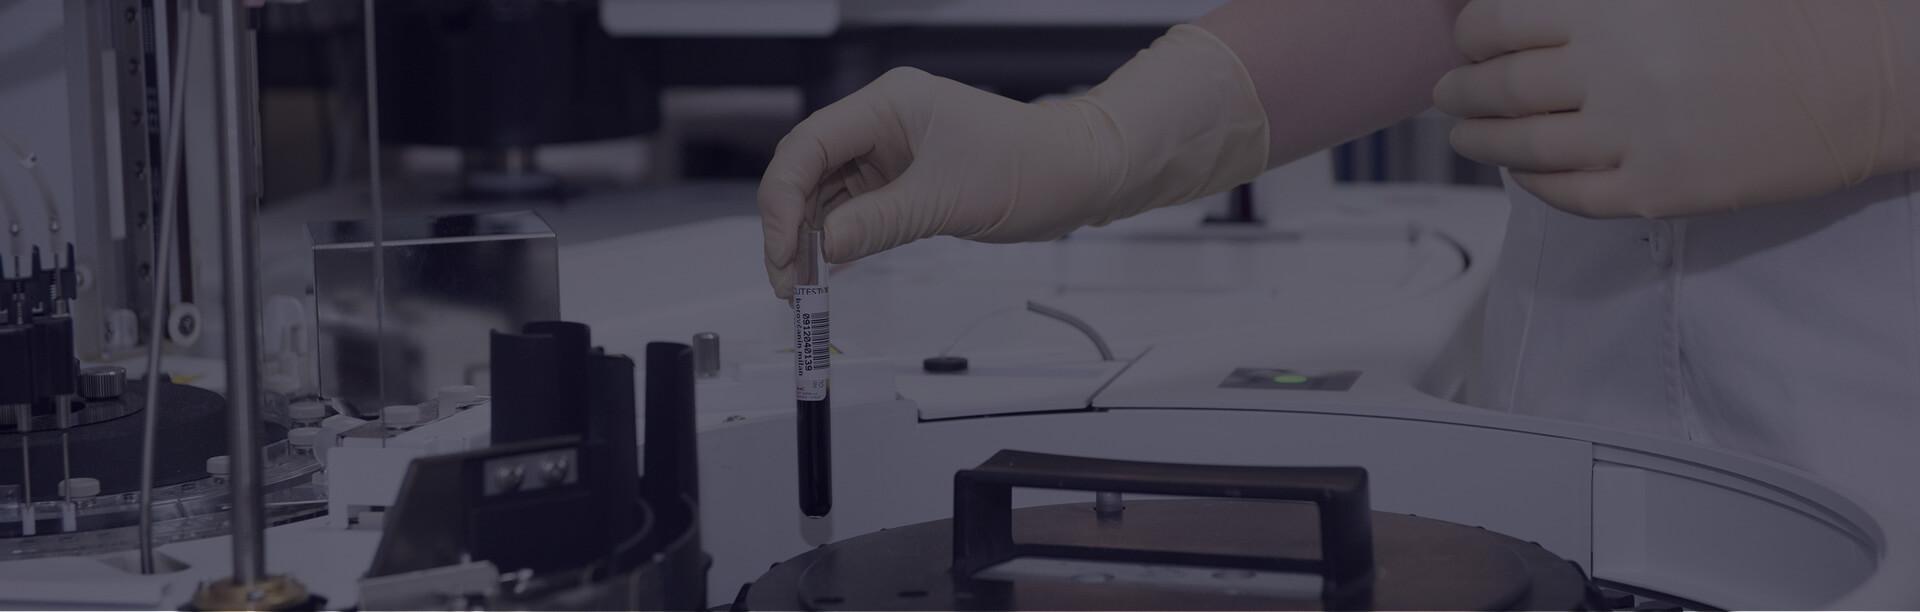 Pharma & LifeSciences